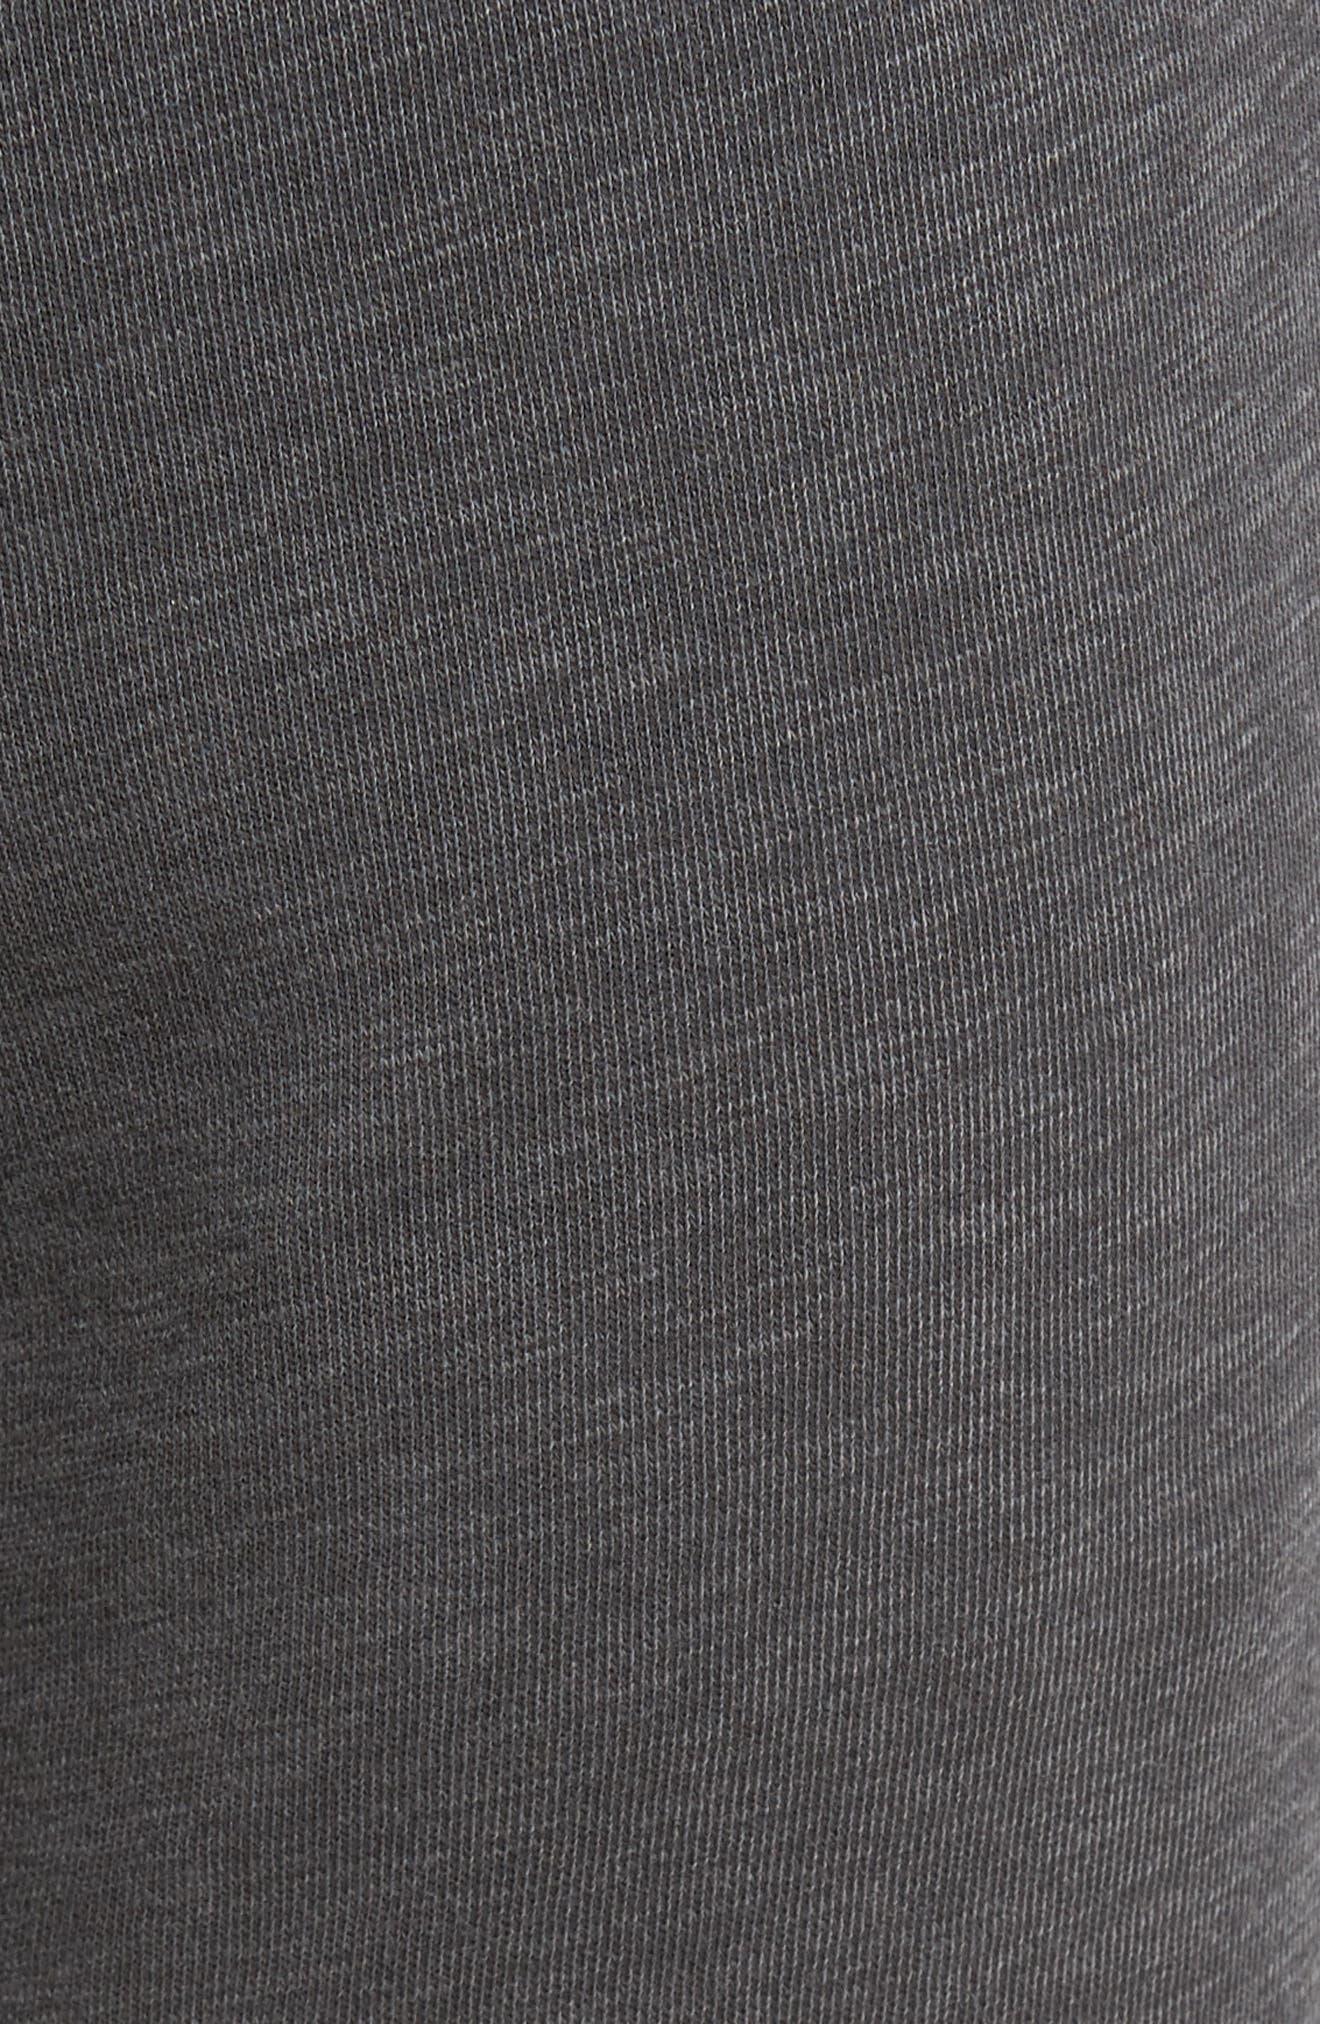 'Classic' Sweatpants,                             Alternate thumbnail 40, color,